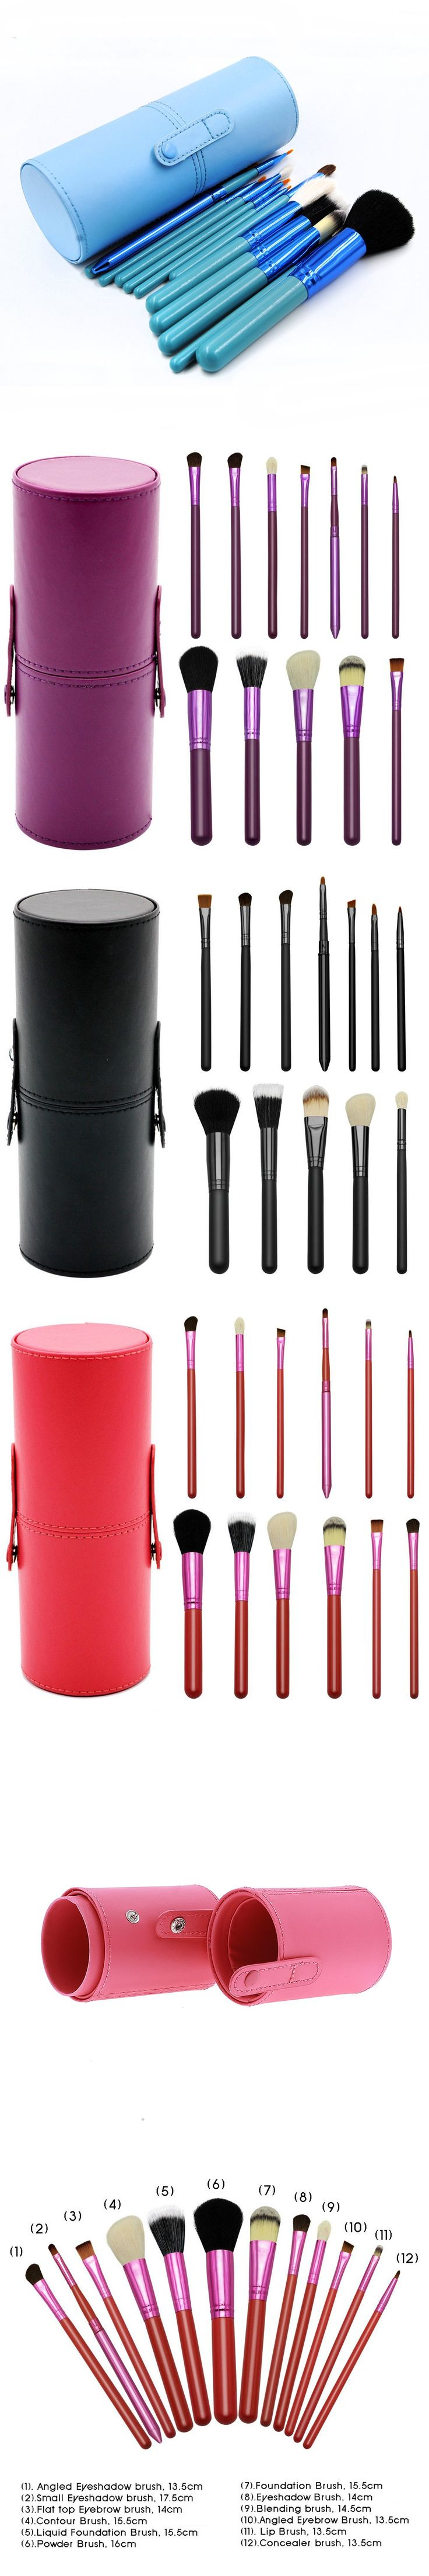 Professional Makeup Brushes Set With Brush Holder Cup 12Pcs Foundation Powder lip Eye Brush pincel maquiagem Makeup Brushes Case